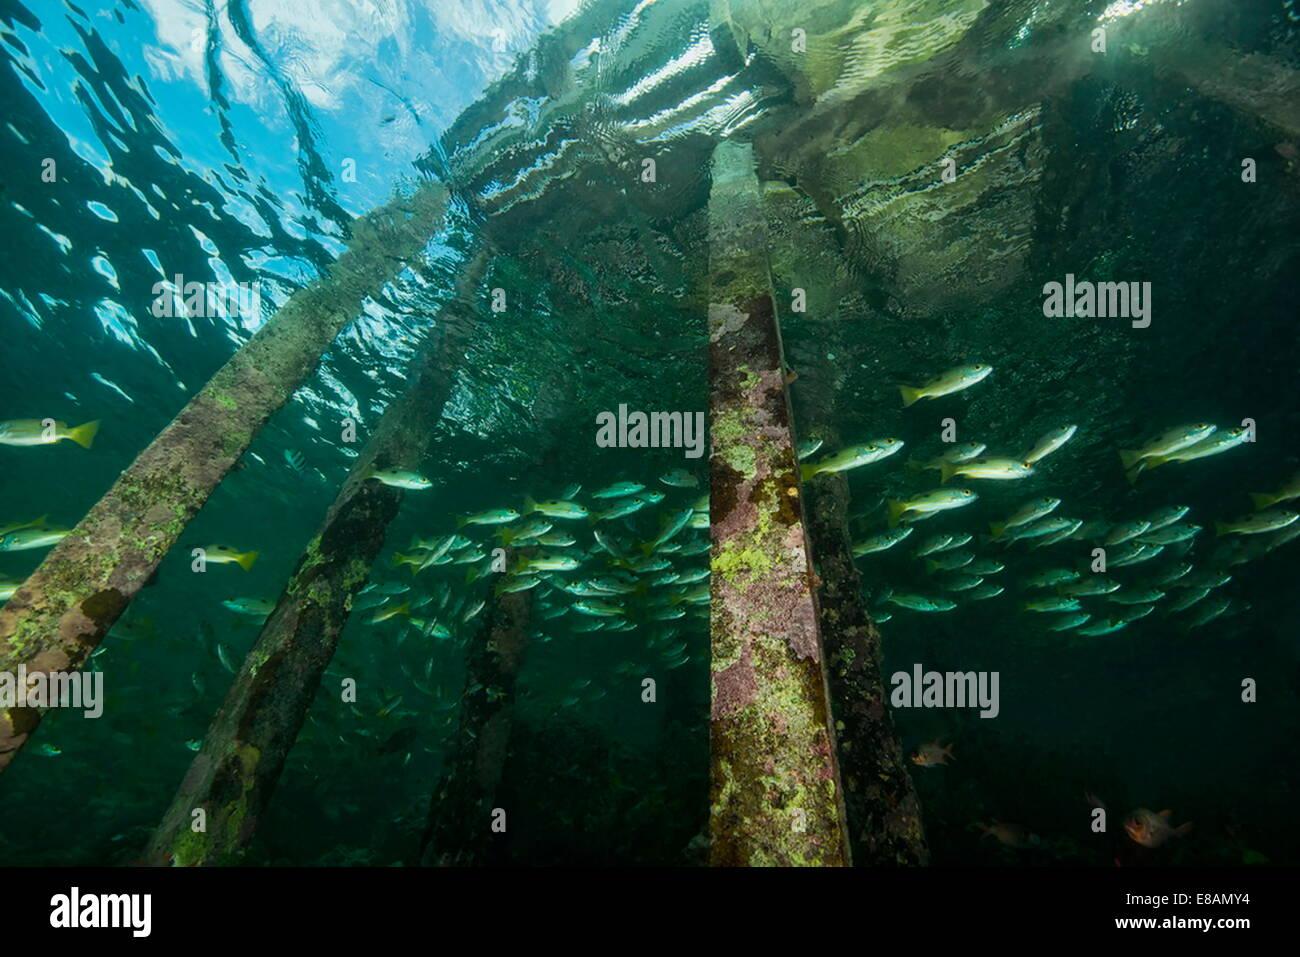 Fish swimming under Welcome Jetty, low angle, Uepi Island, New Britain, Solomon Islands - Stock Image